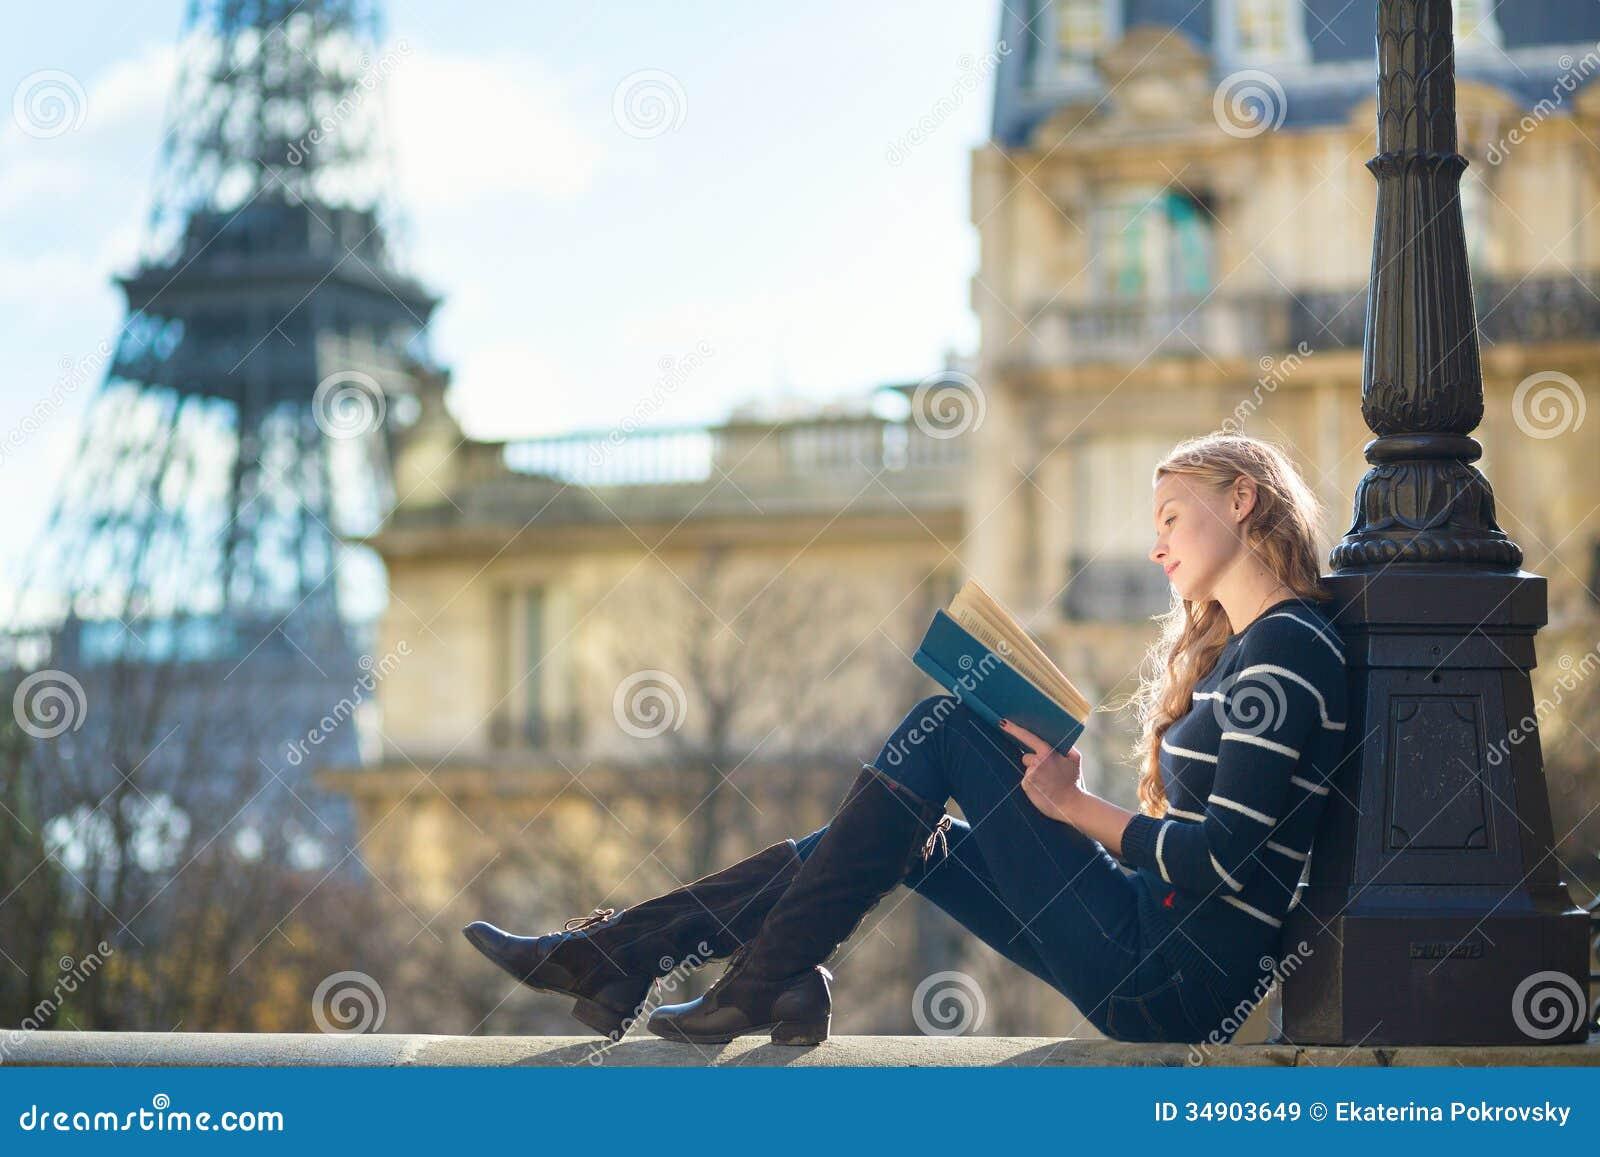 beautiful young woman paris reading book near eiffel tower 34903649